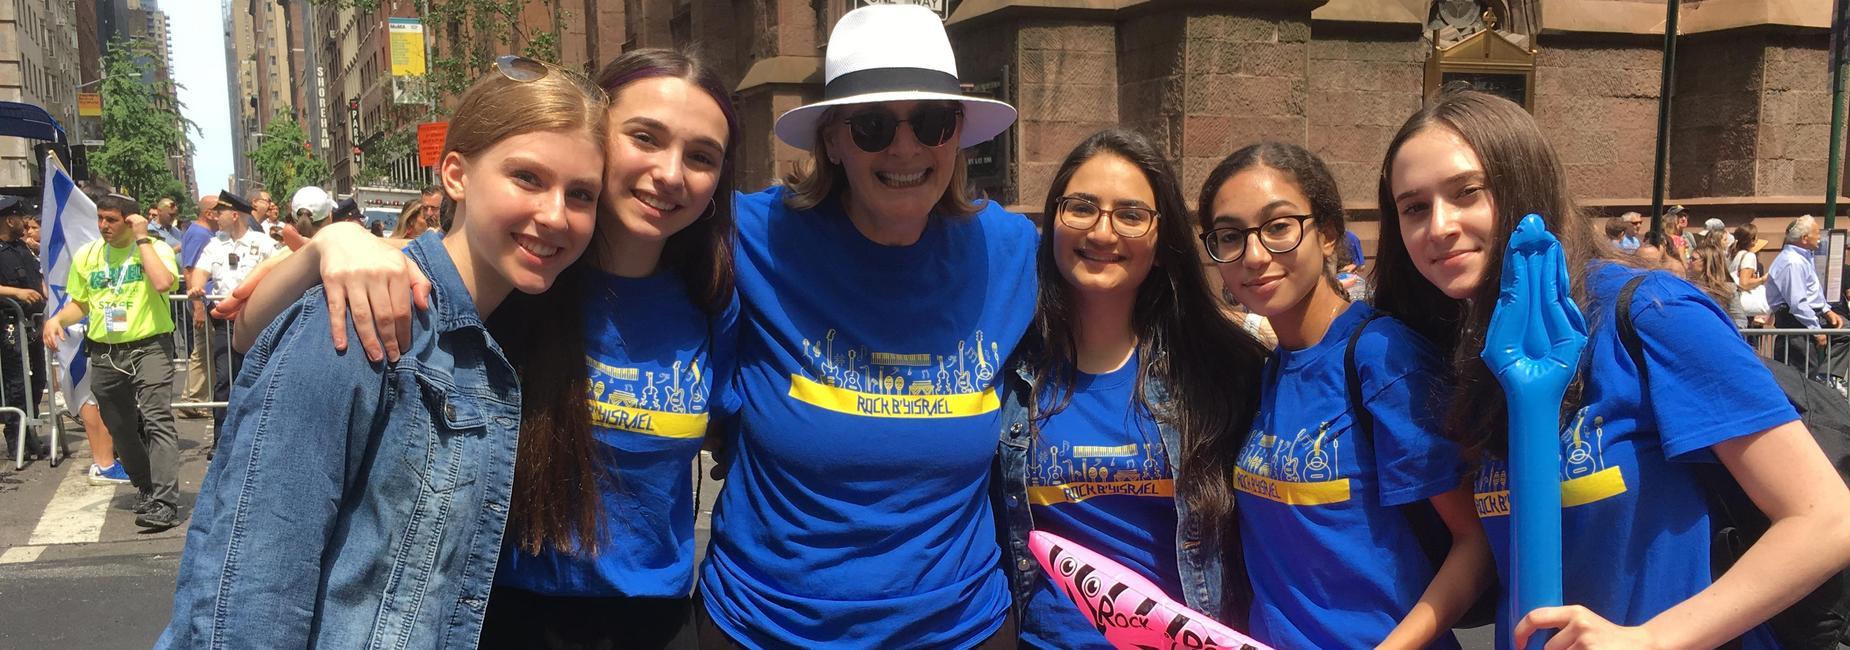 WHHS students at Celebrate Israel Parade